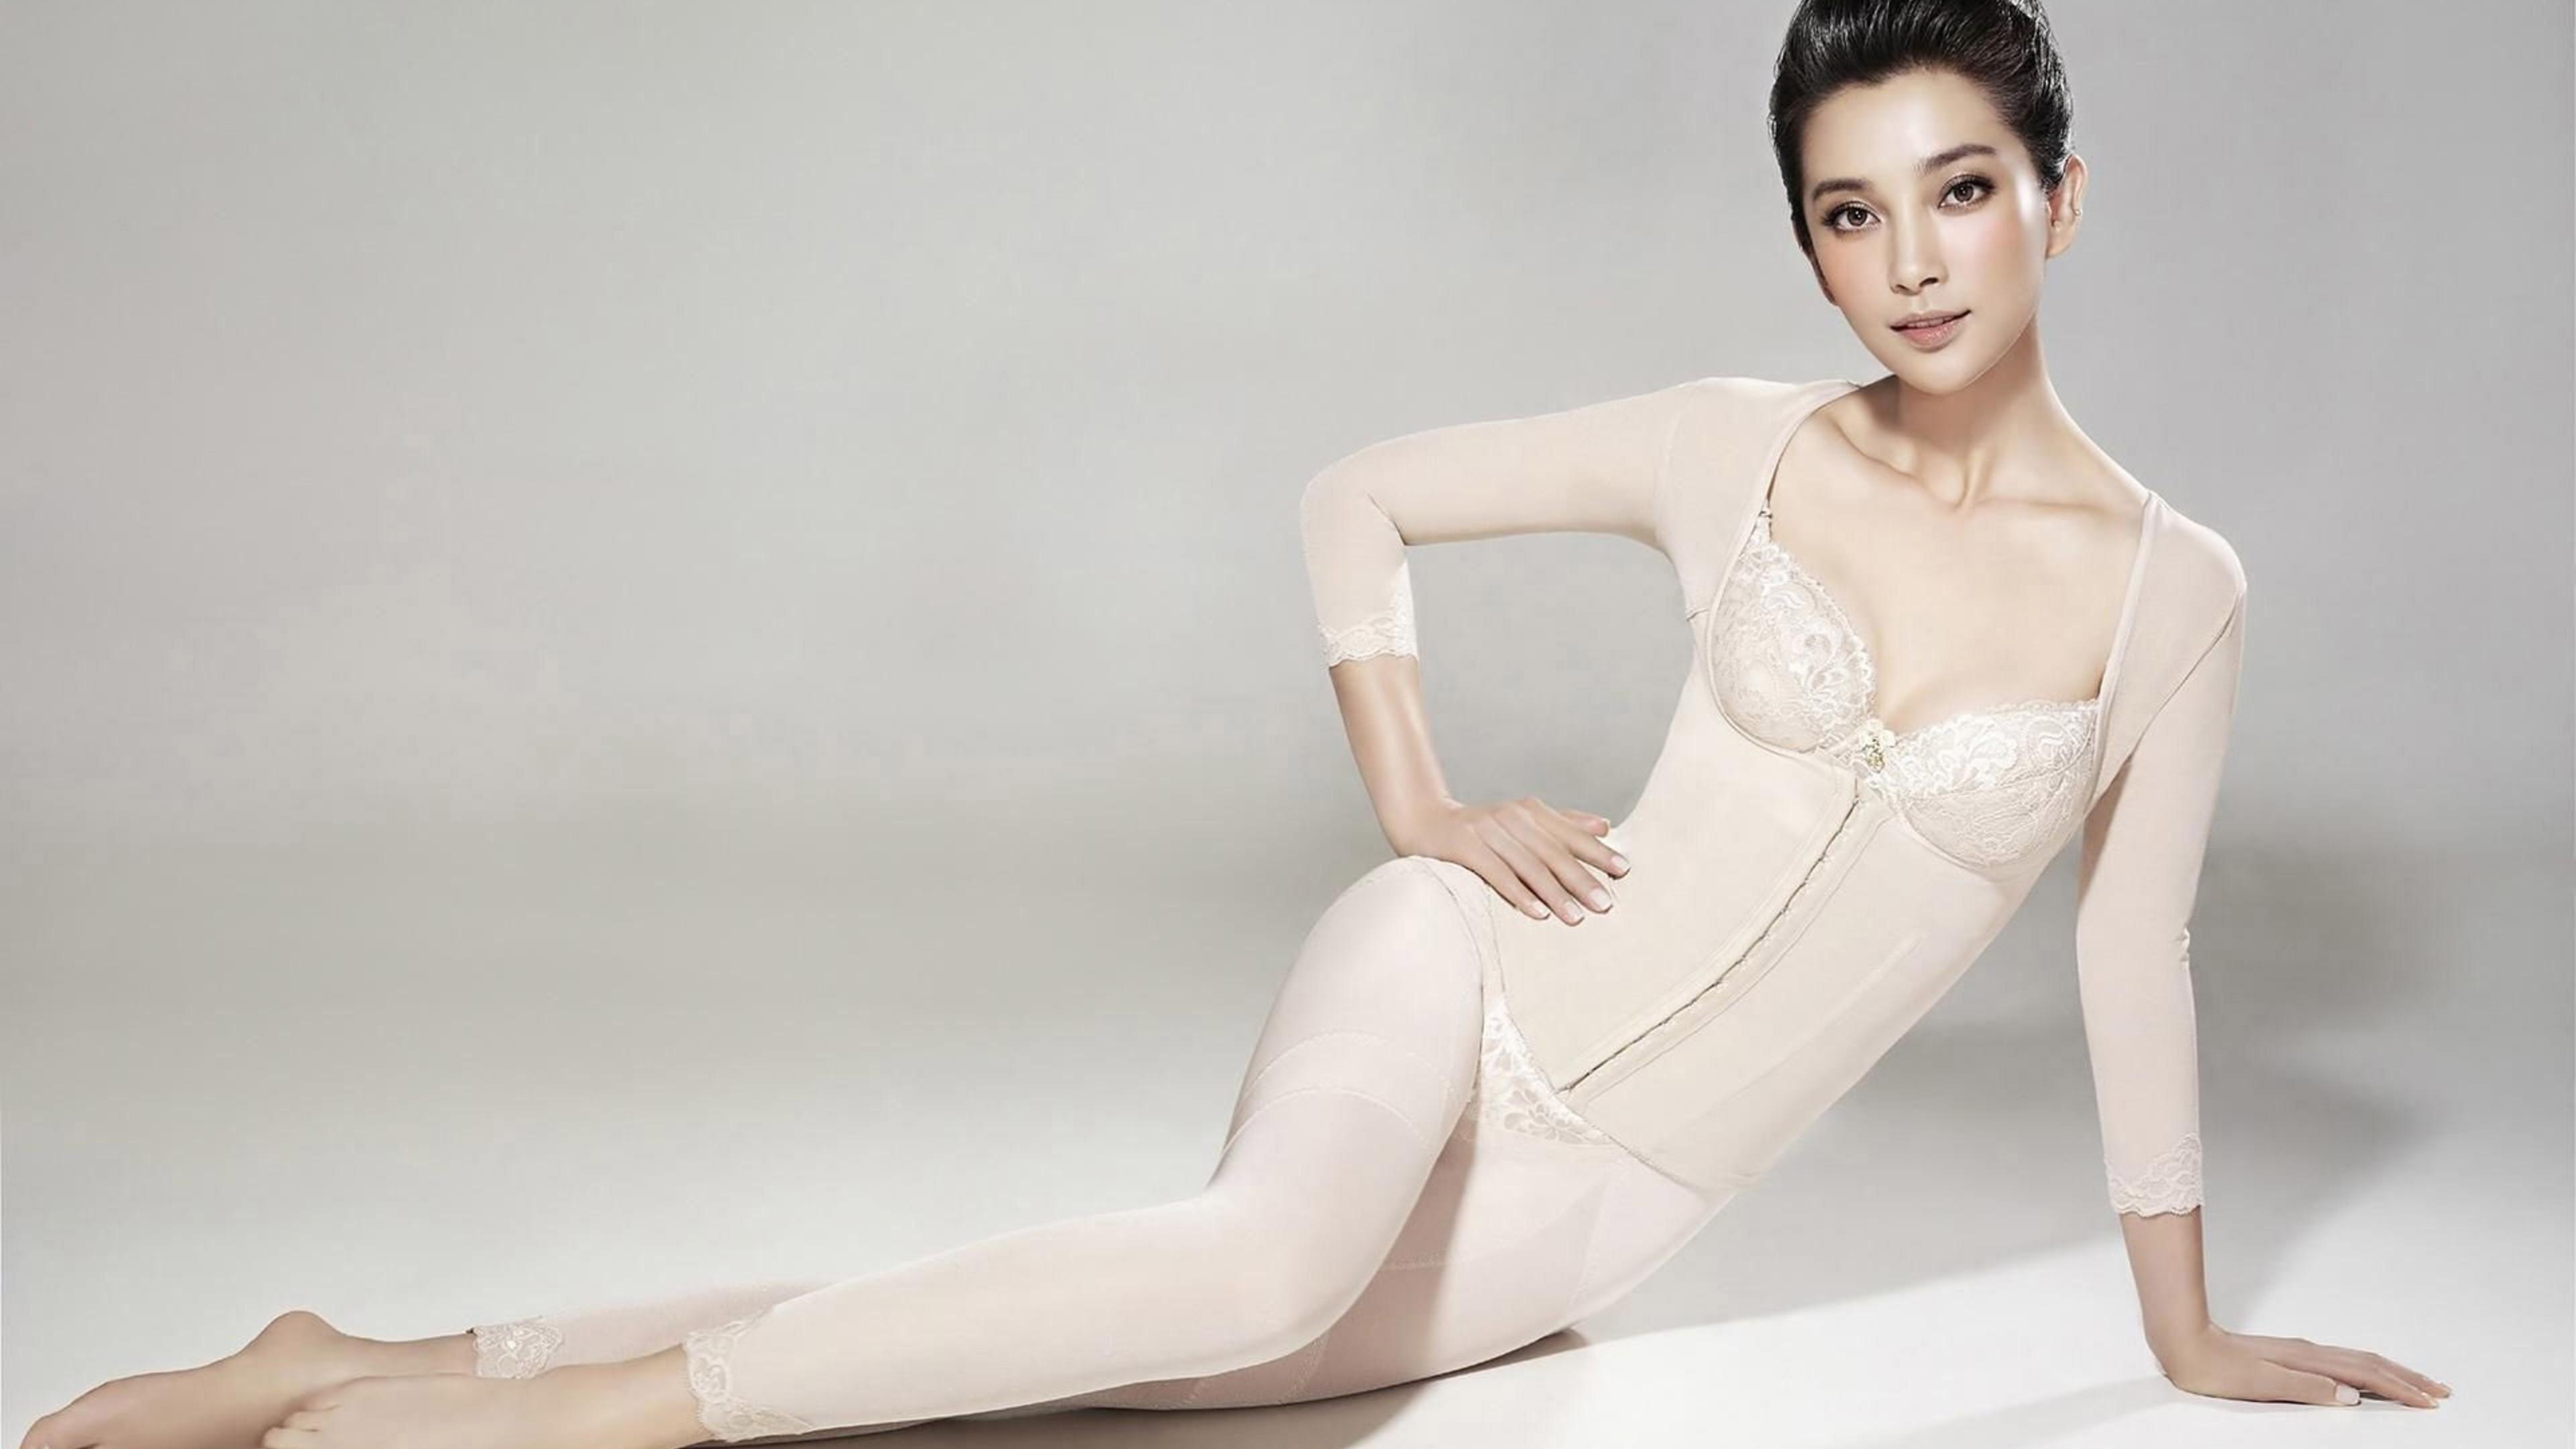 bingbing chinese actress 1536855761 - Bingbing Chinese Actress - li bingbing wallpapers, girls wallpapers, chinese wallpapers, celebrities wallpapers